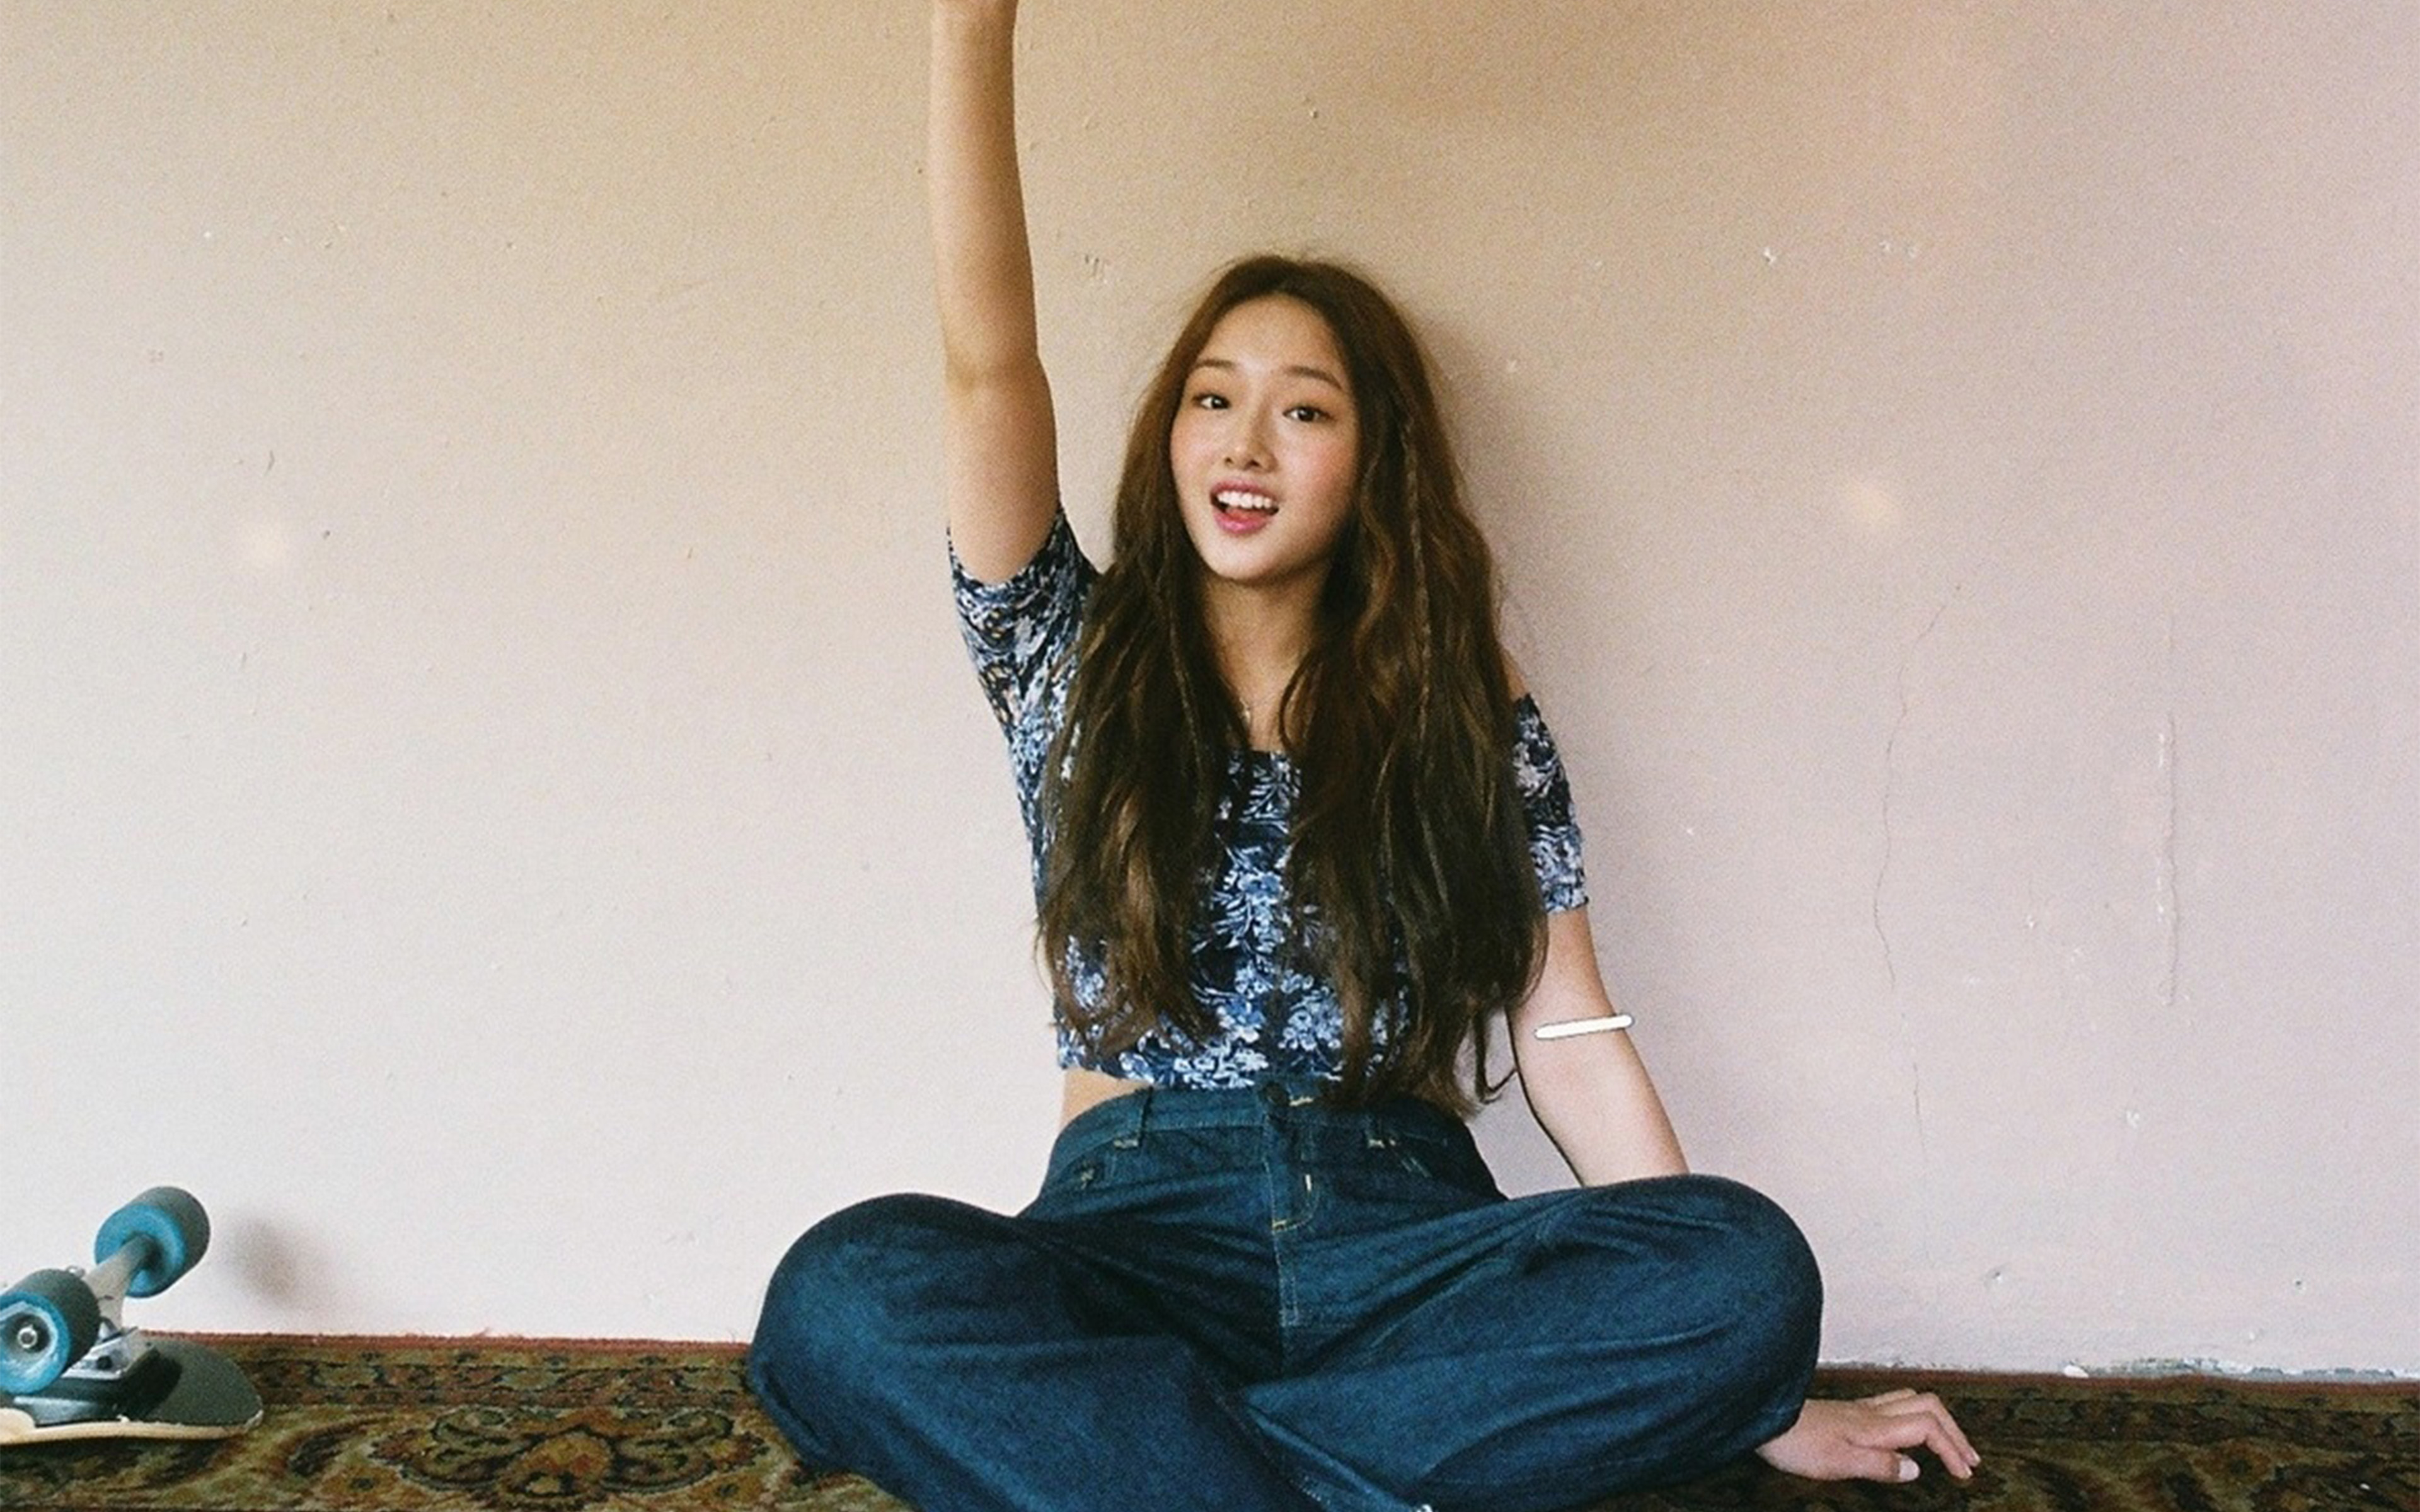 ho81-kpop-girl-smile-cute-woman-asian-wallpaper